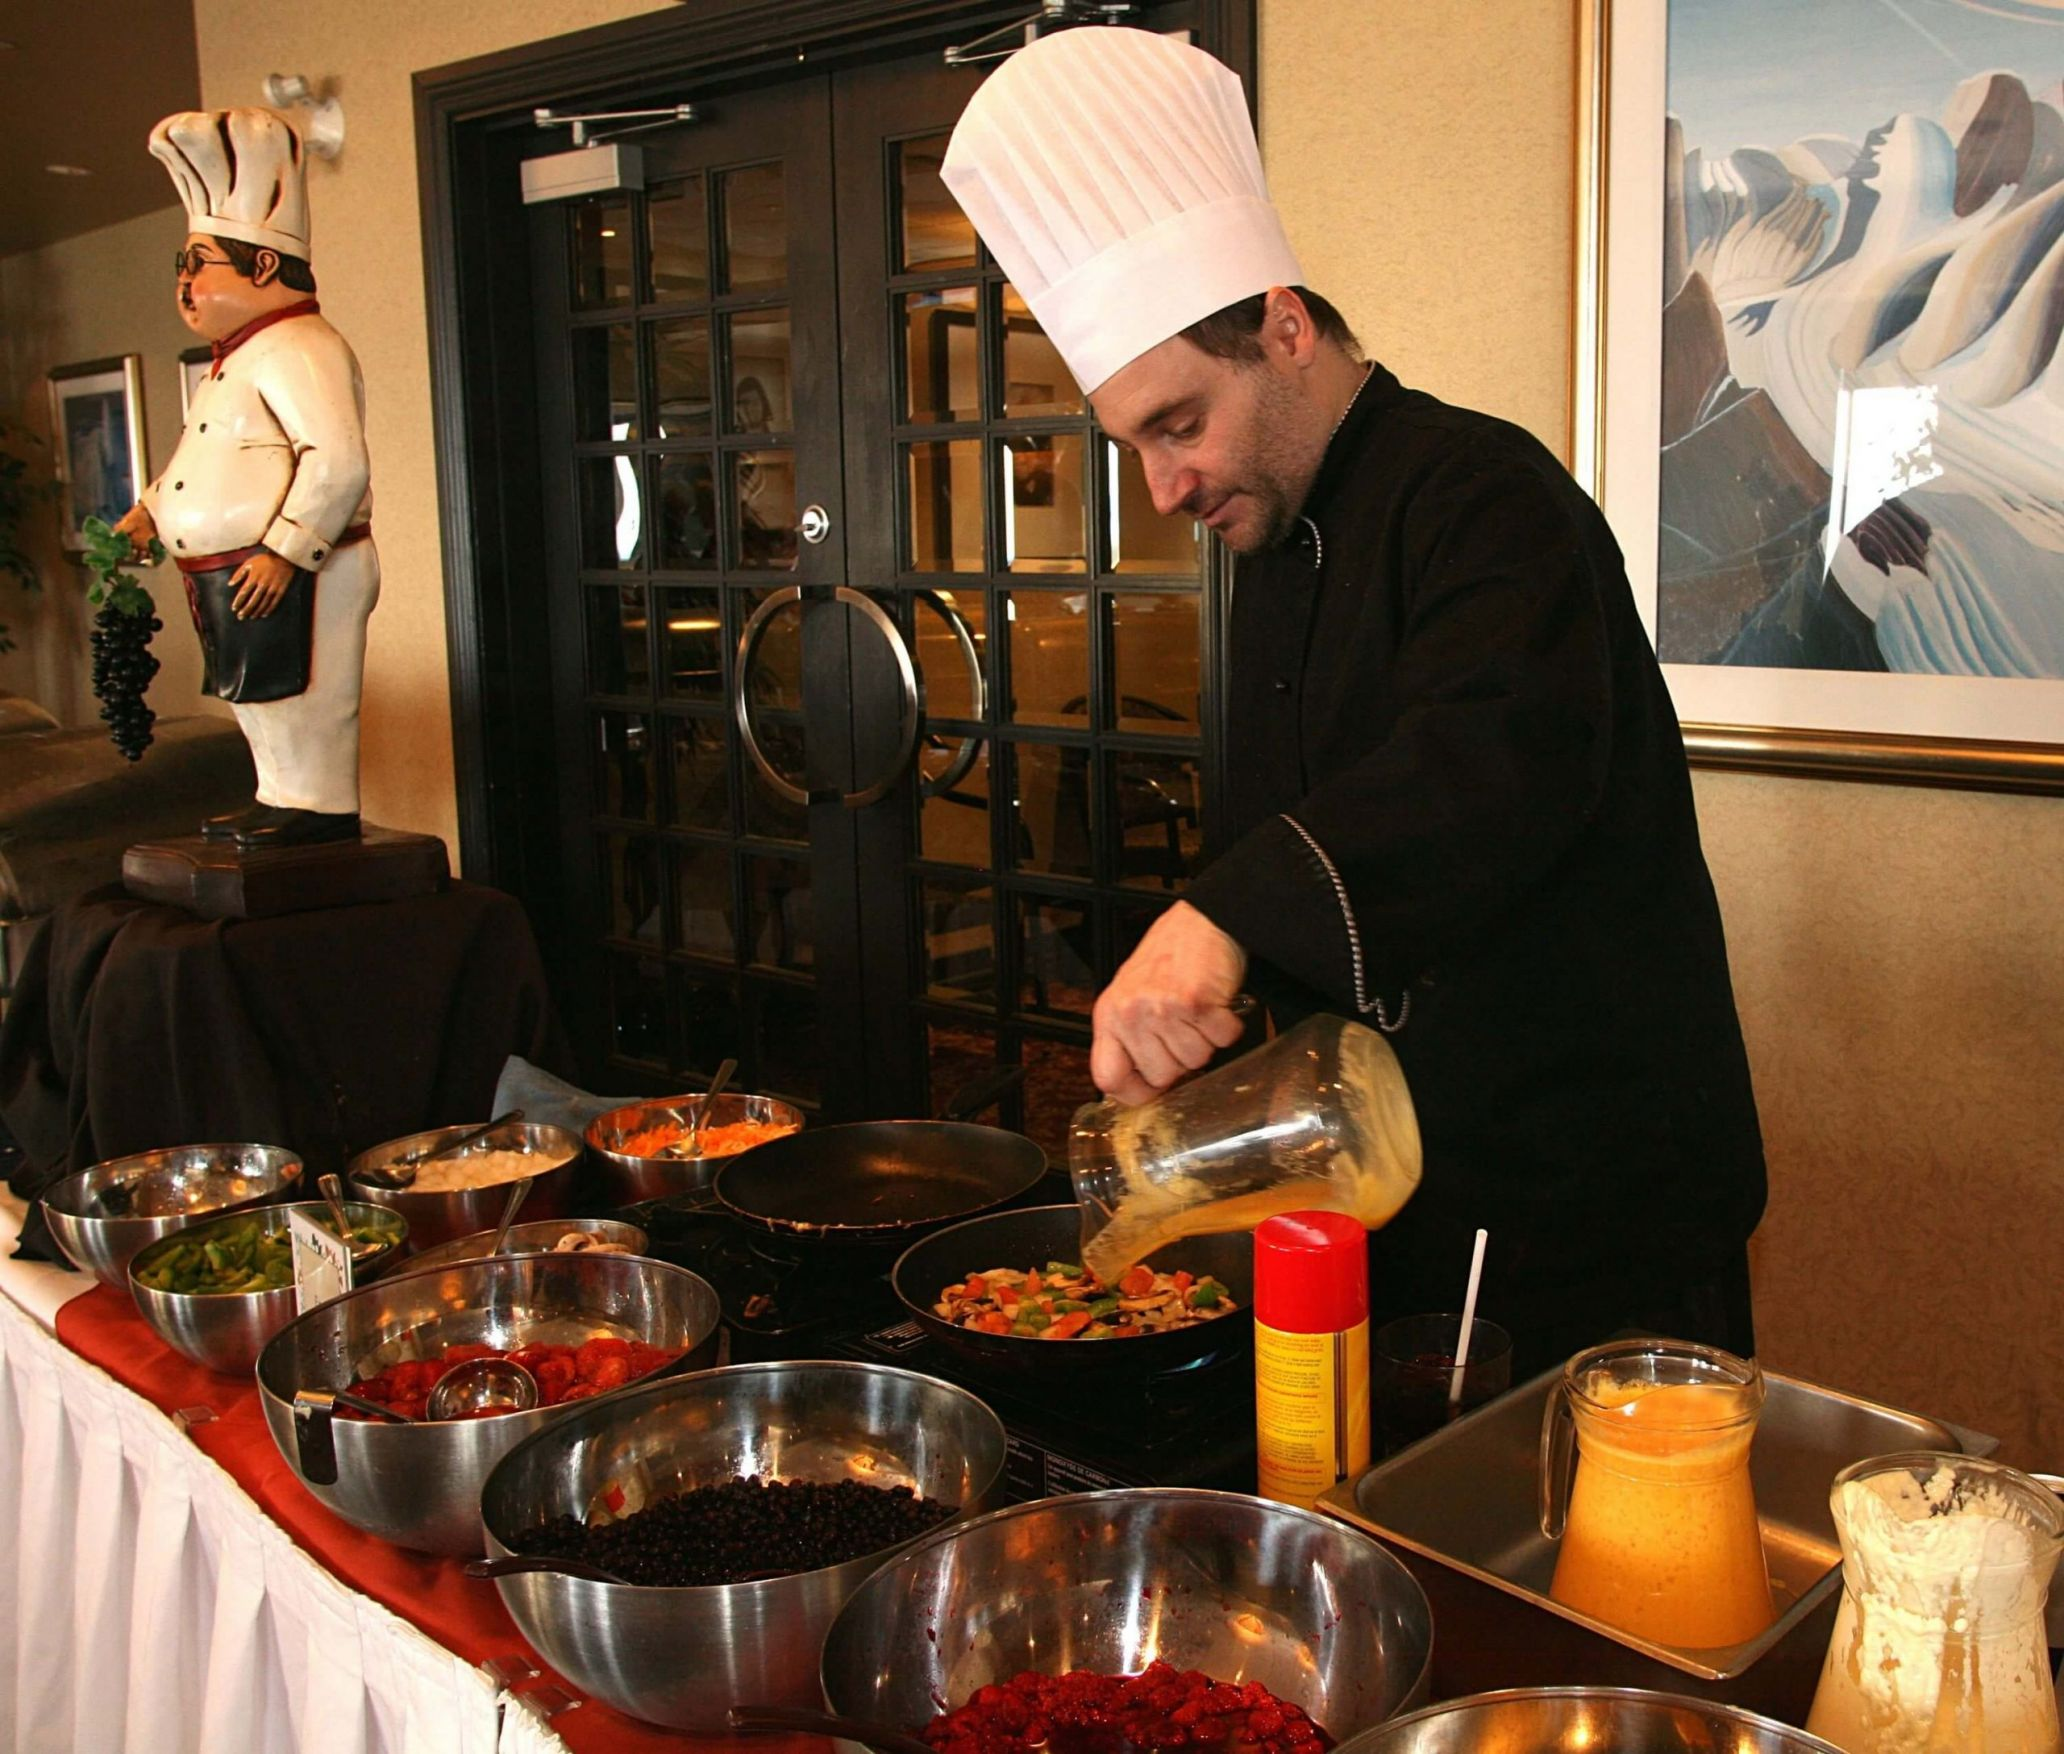 Chef preparing food - Frobisher Inn